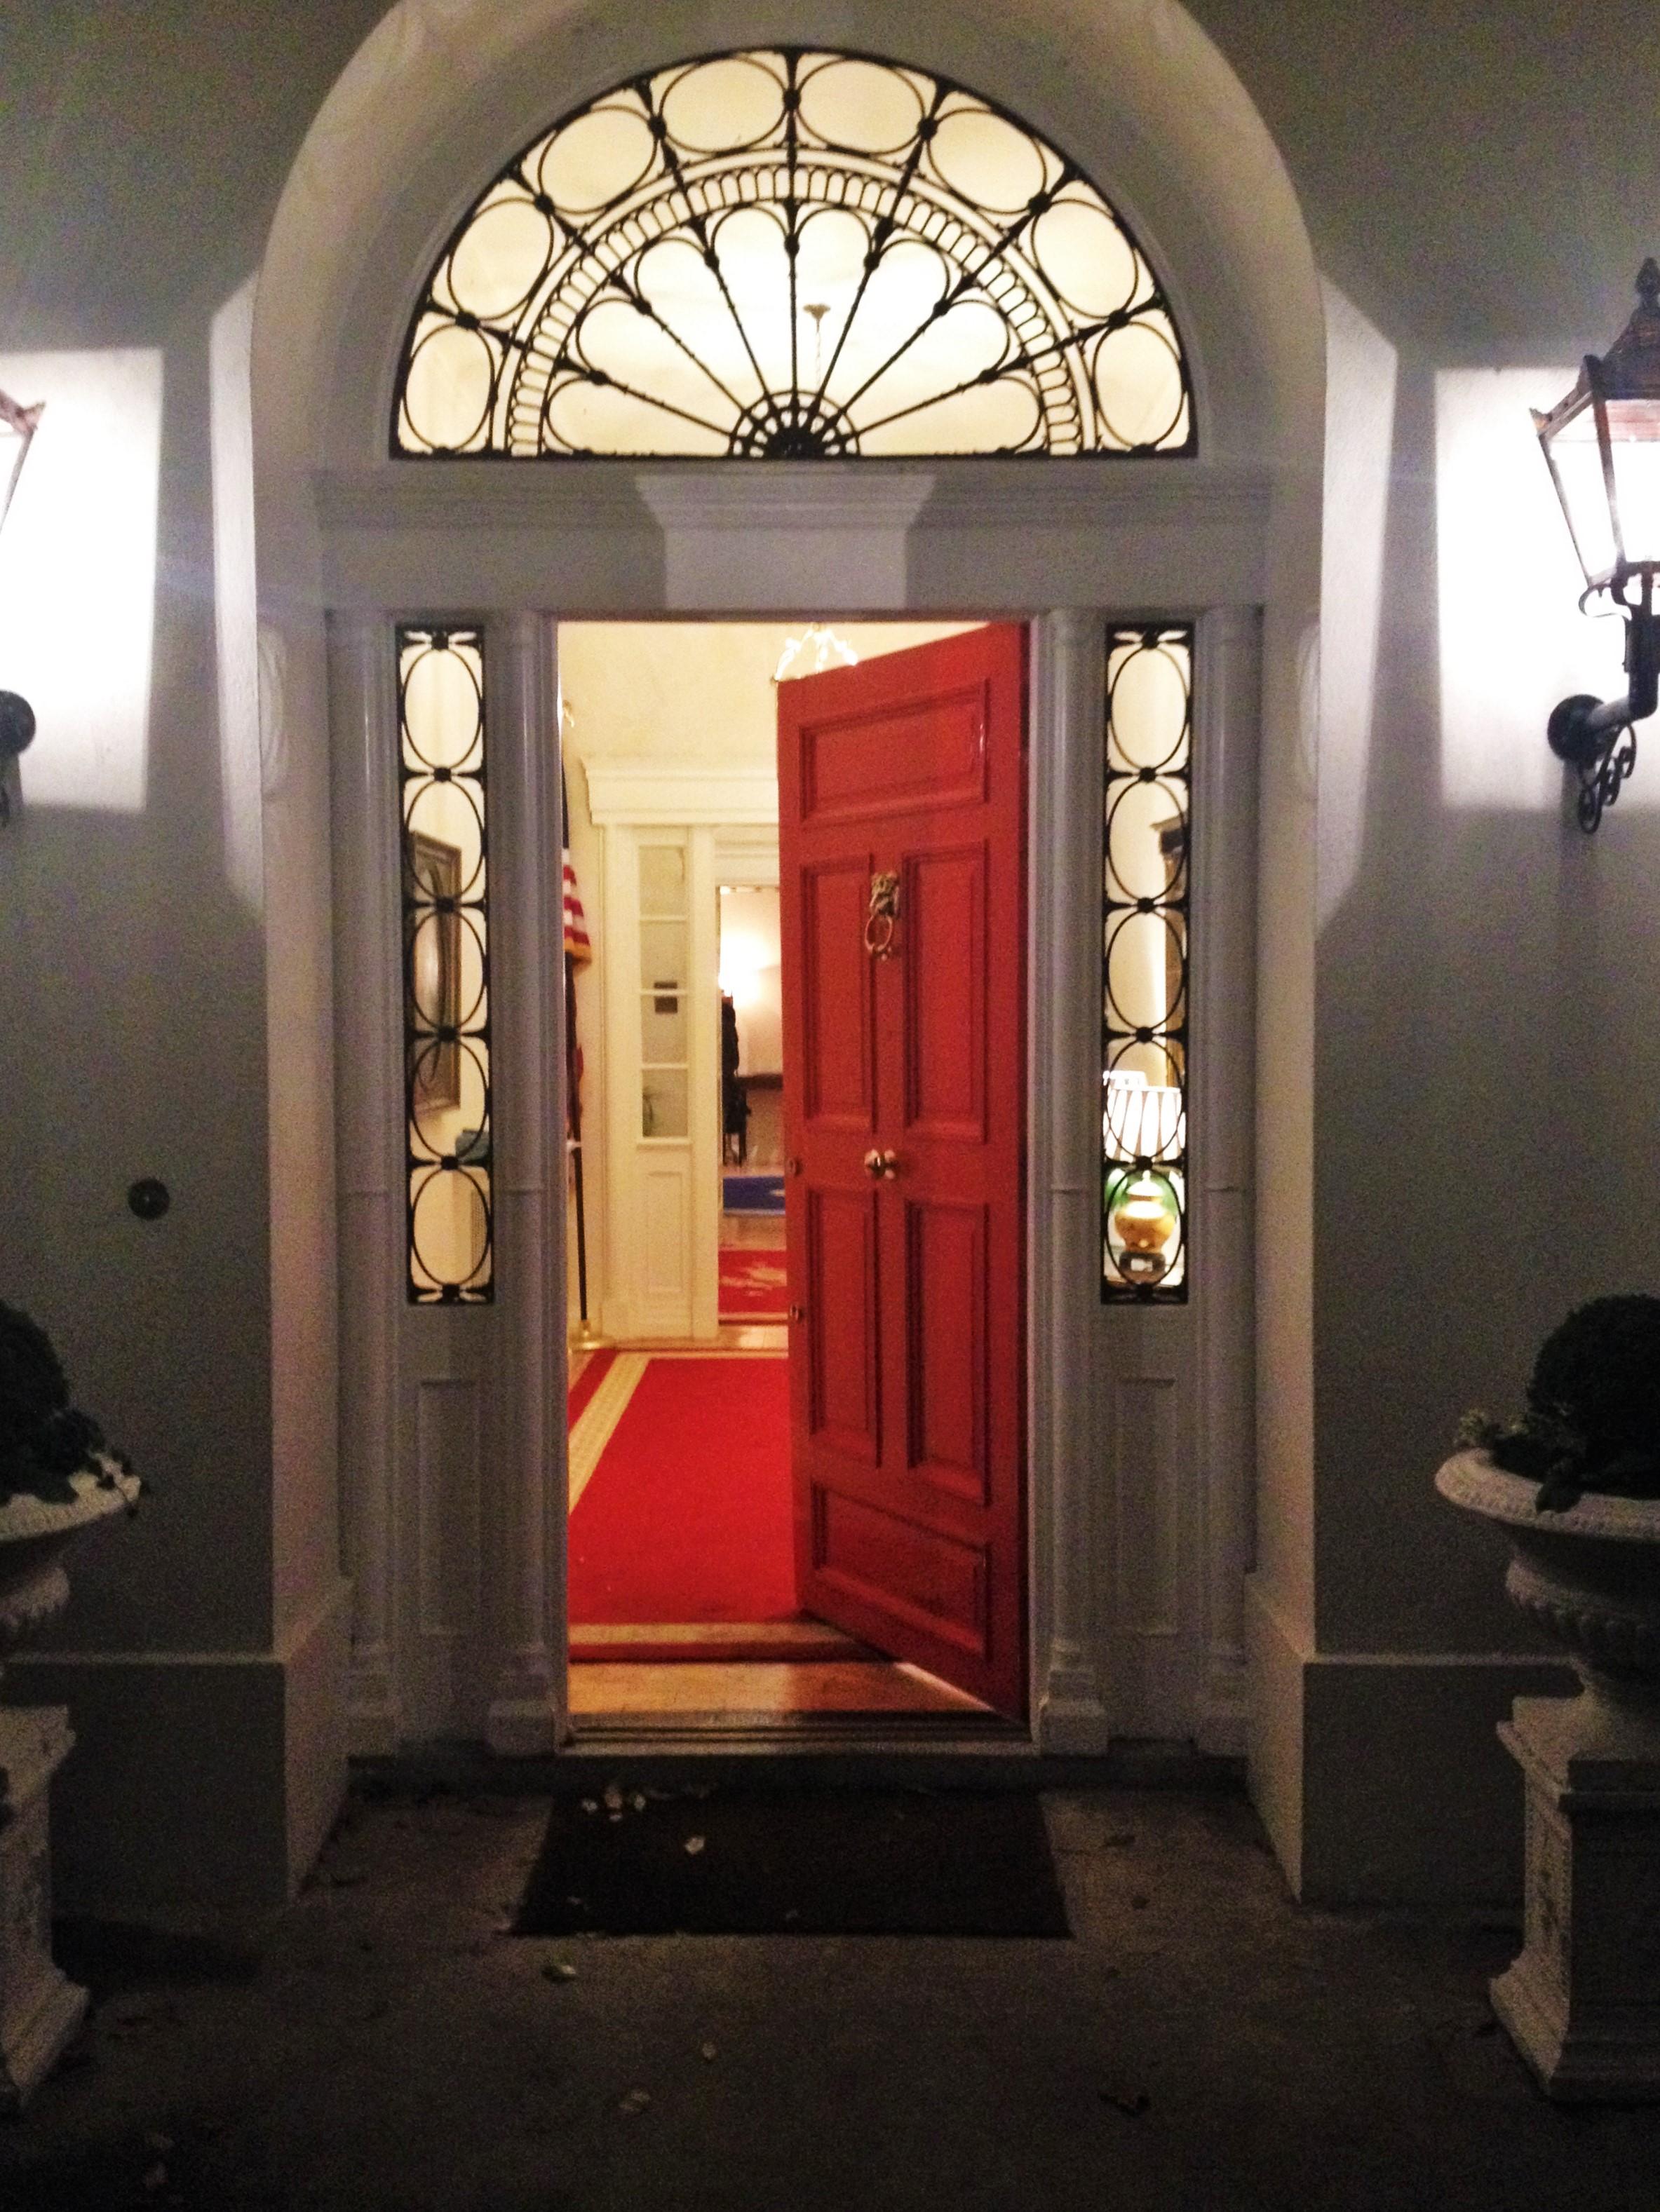 CAPAStudyAbroad_Dublin_Spring2017_From Nathan Overlock - Food at Ambassadors Residence4.jpg